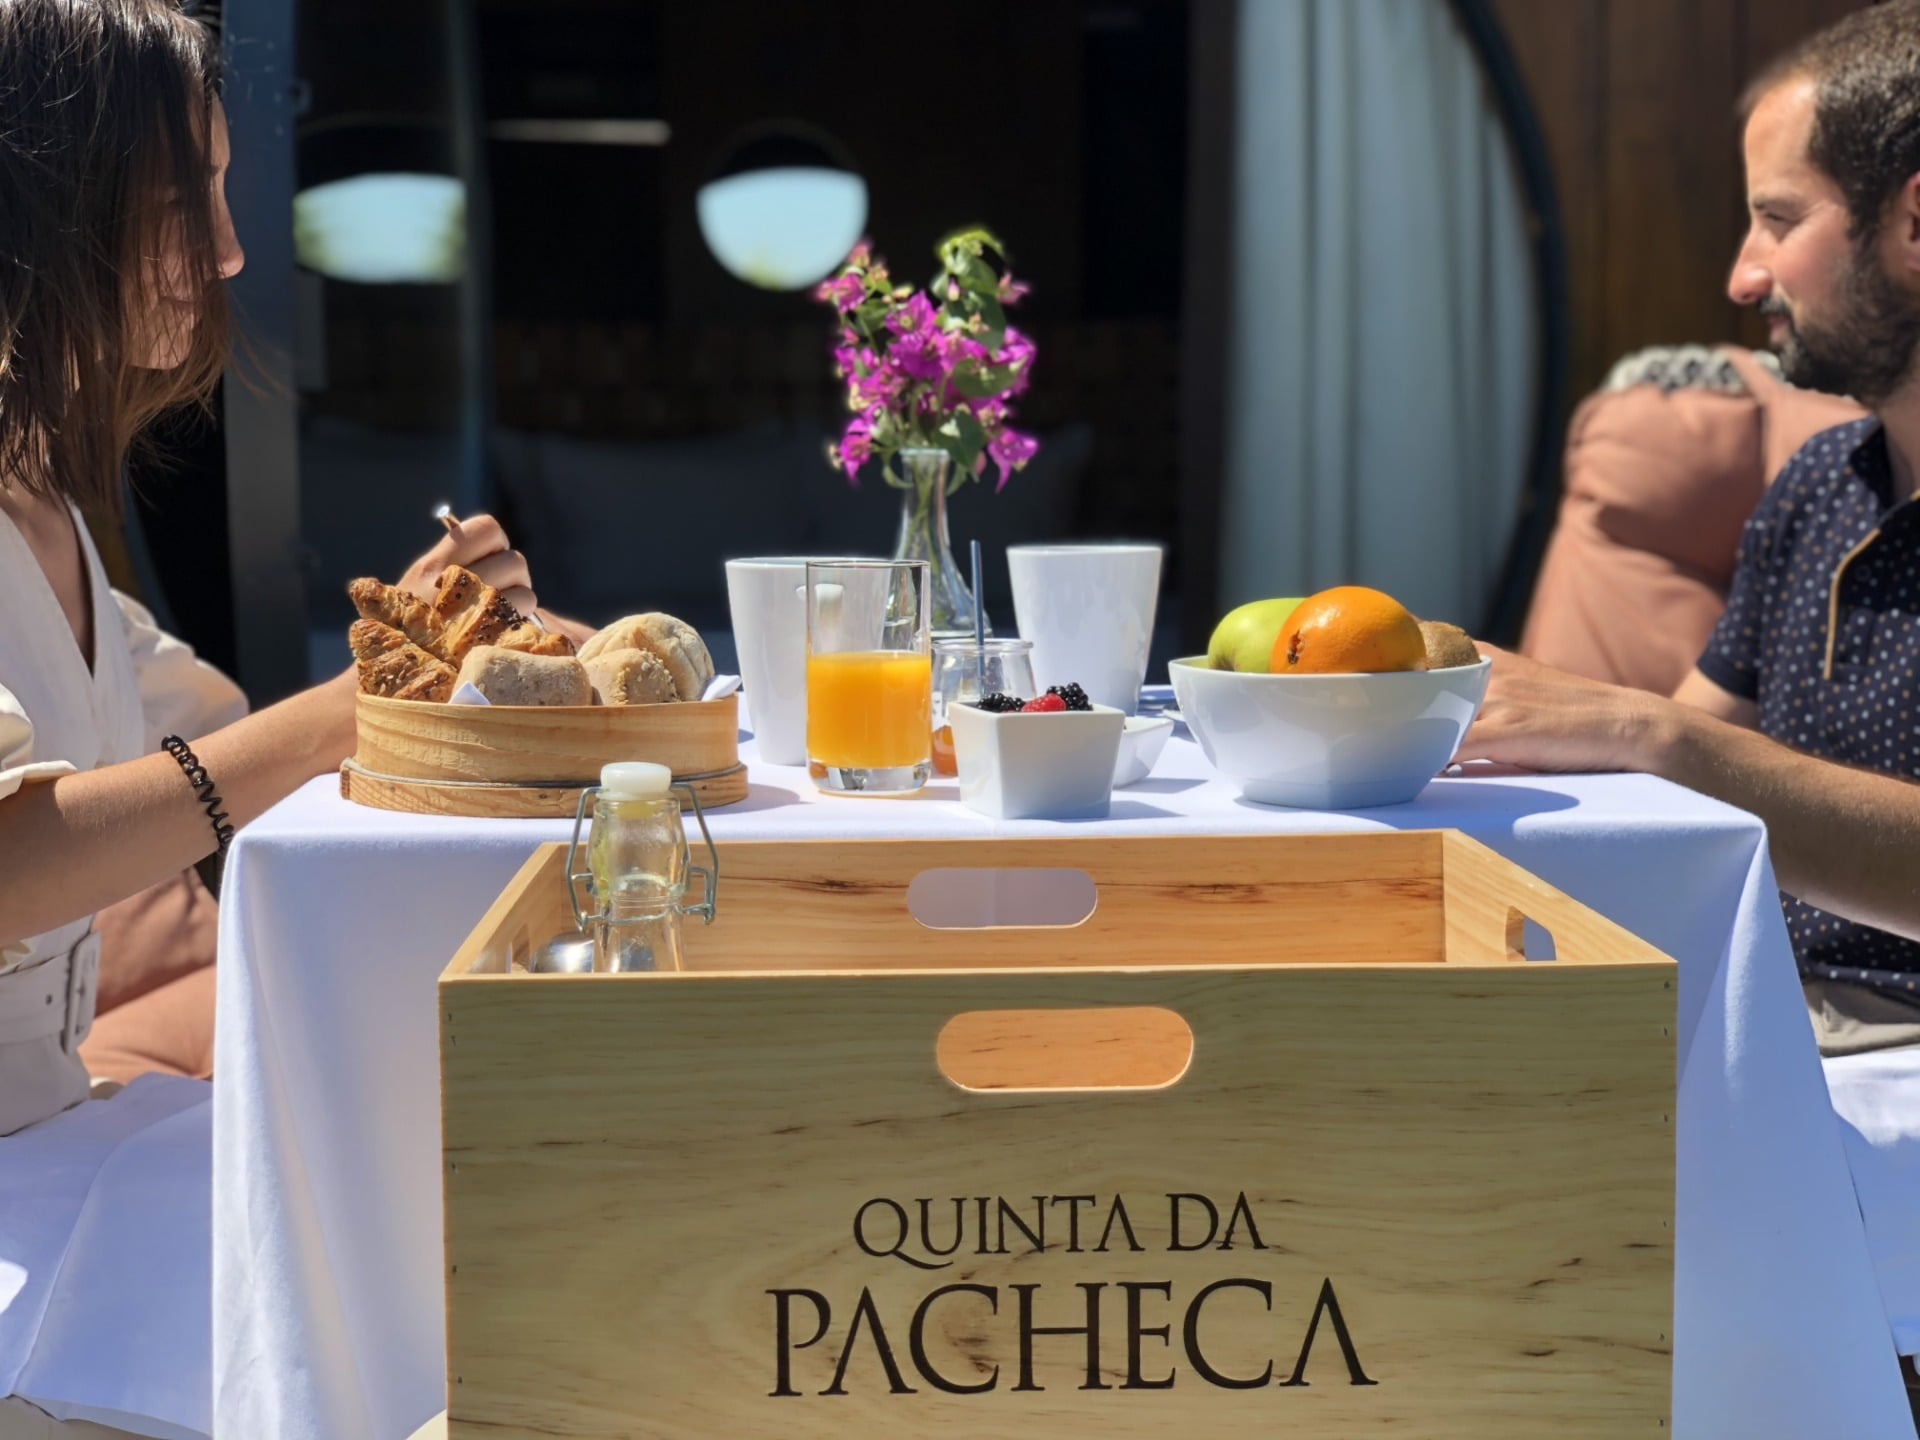 Quinta da Pacheca - One Night Break